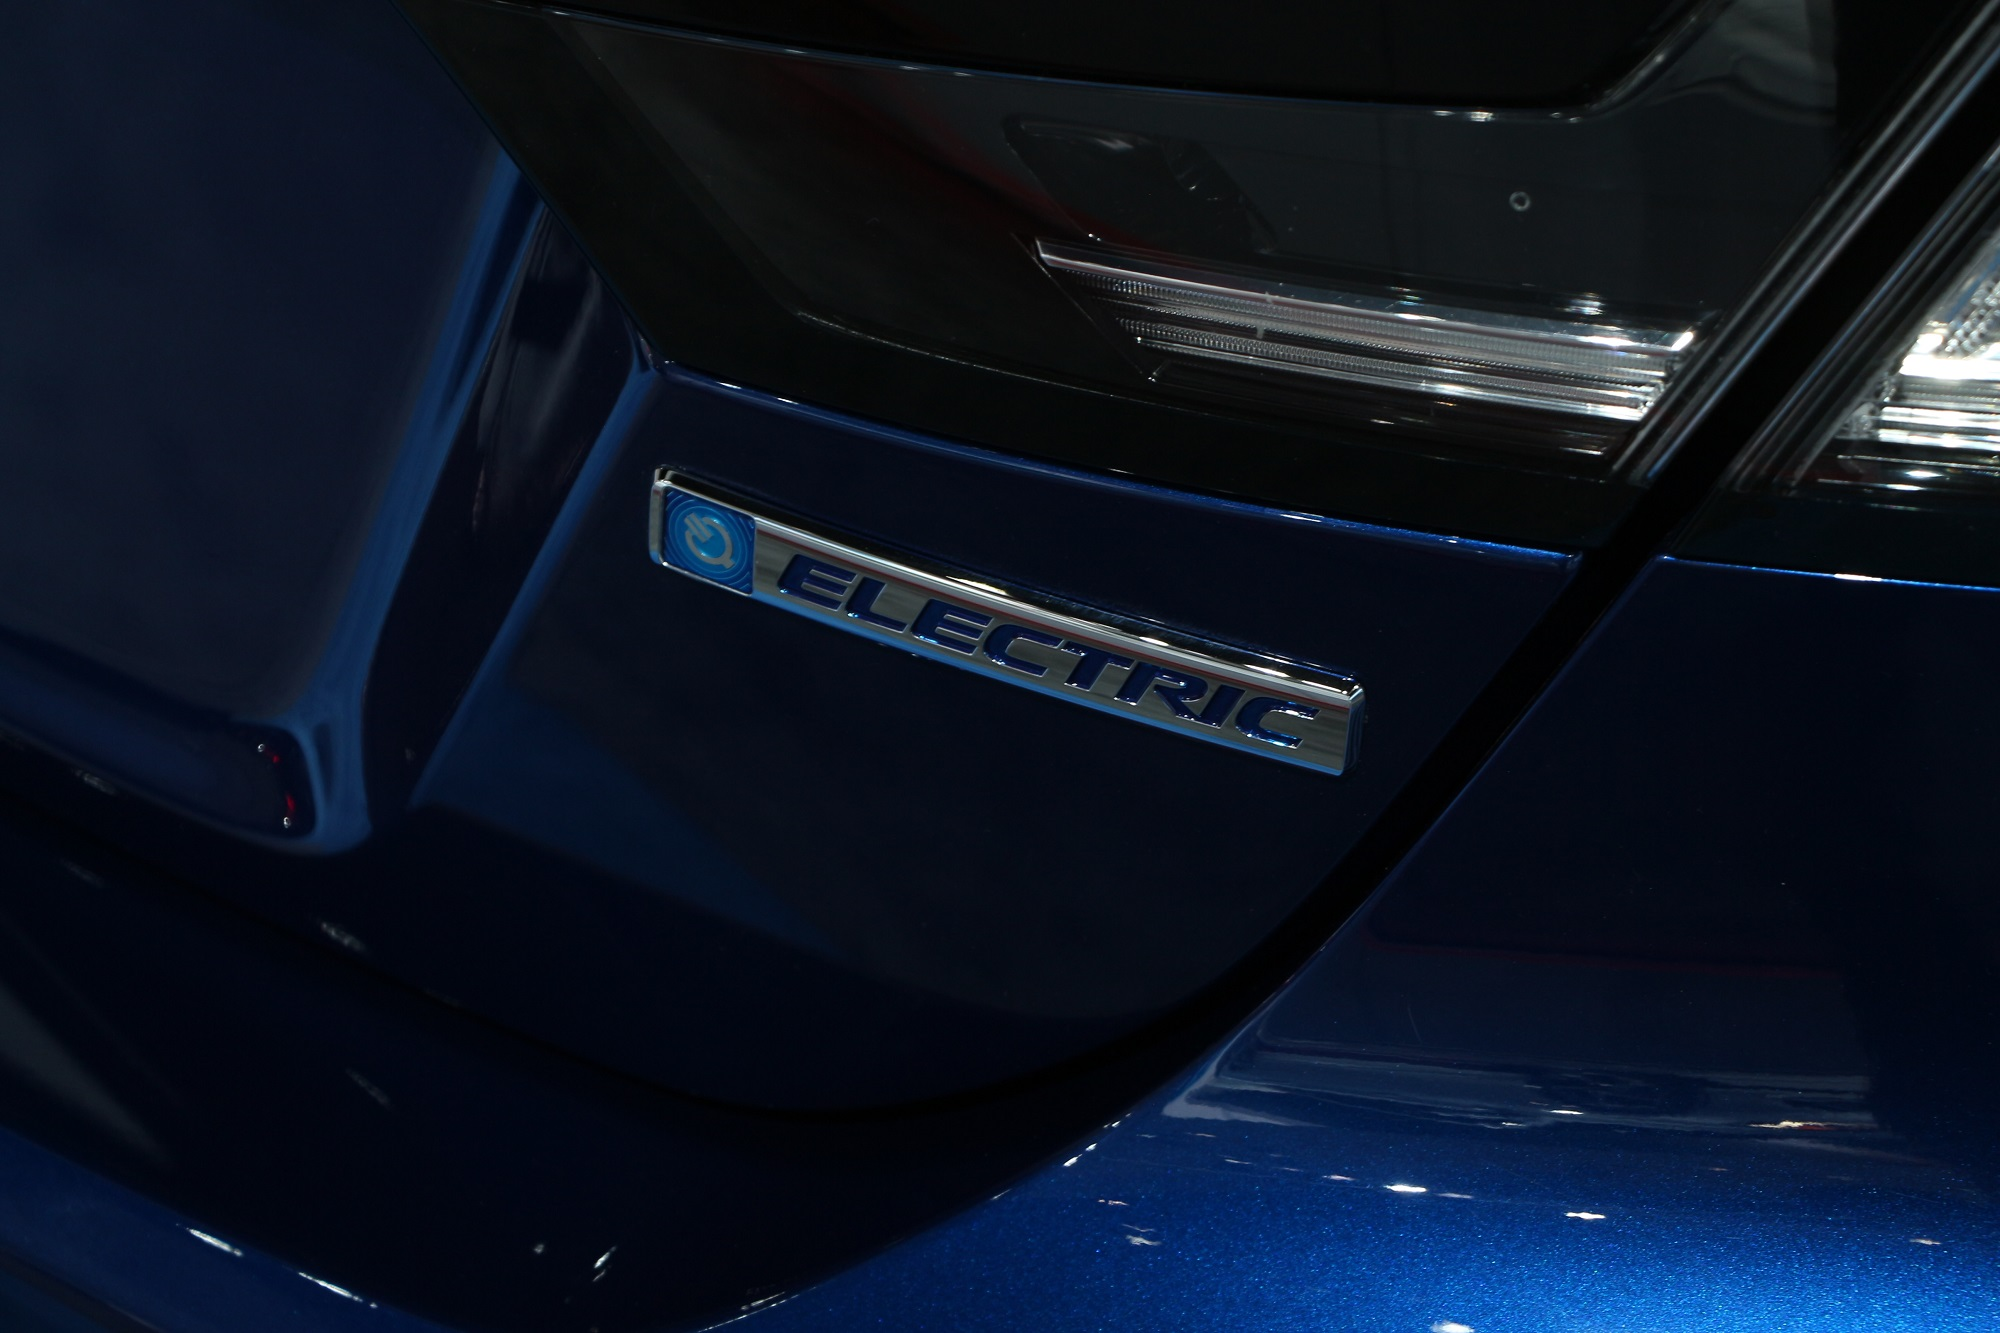 Honda-tech.com 2018 2017 LA Los Angeles Auto Show Honda Accord Civic Si Type R Odyssey Pilot CR-V HR-V Fit Sport FCX Clarity Hybrid Hydrogen Electric IndyCar